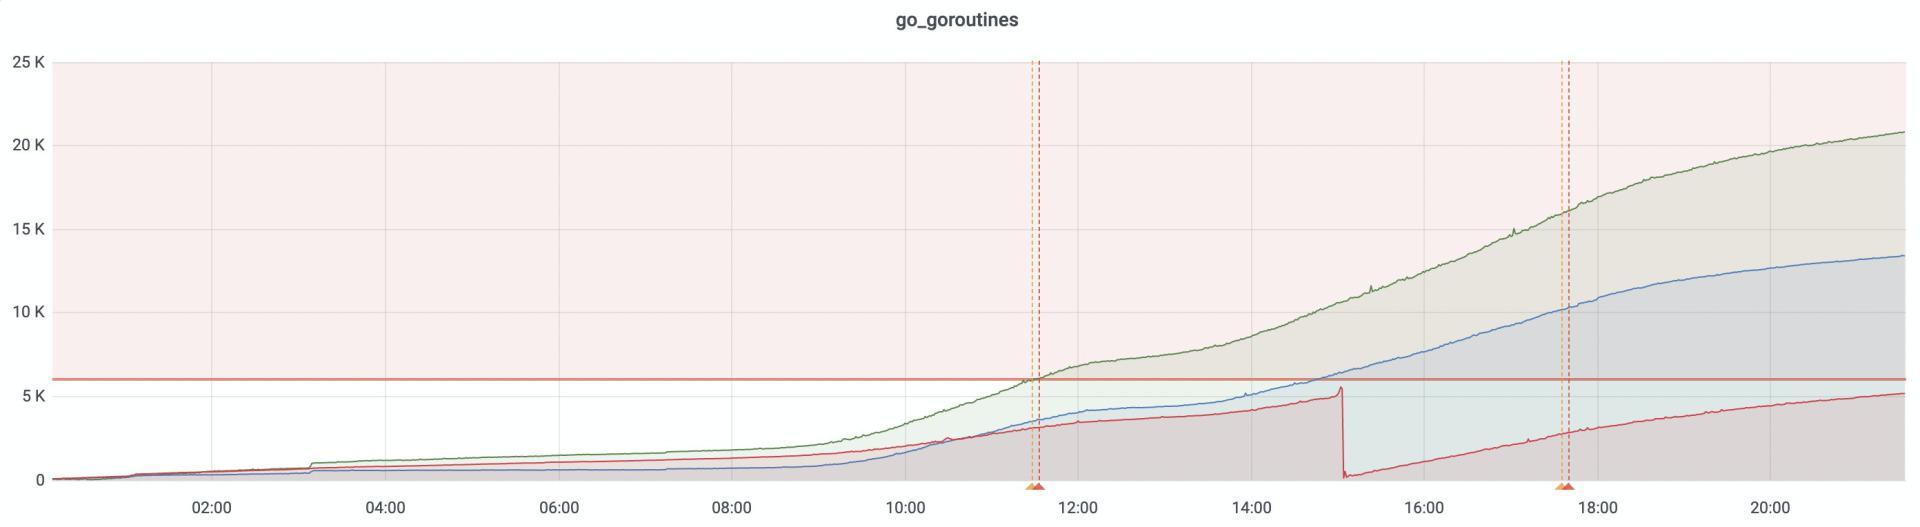 goroutine leaks